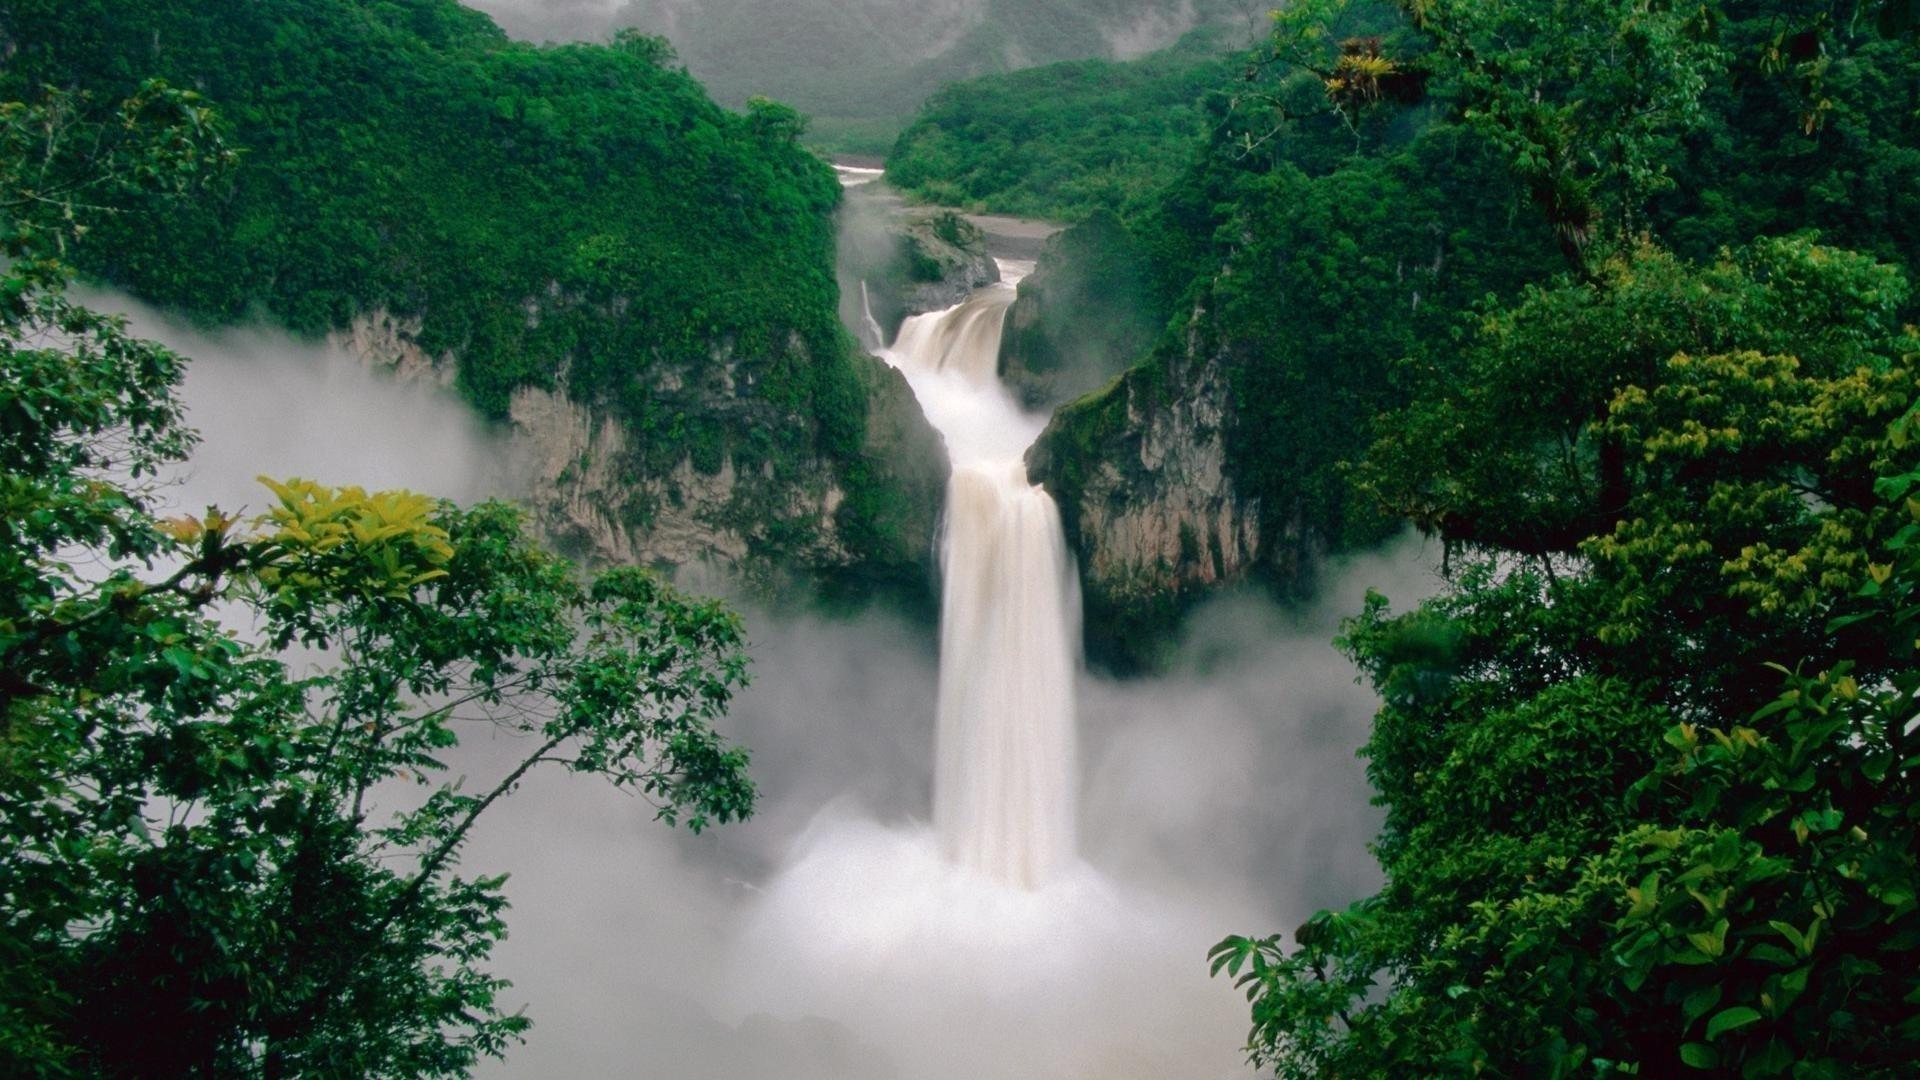 Ecuador Nature wallpaper for pc